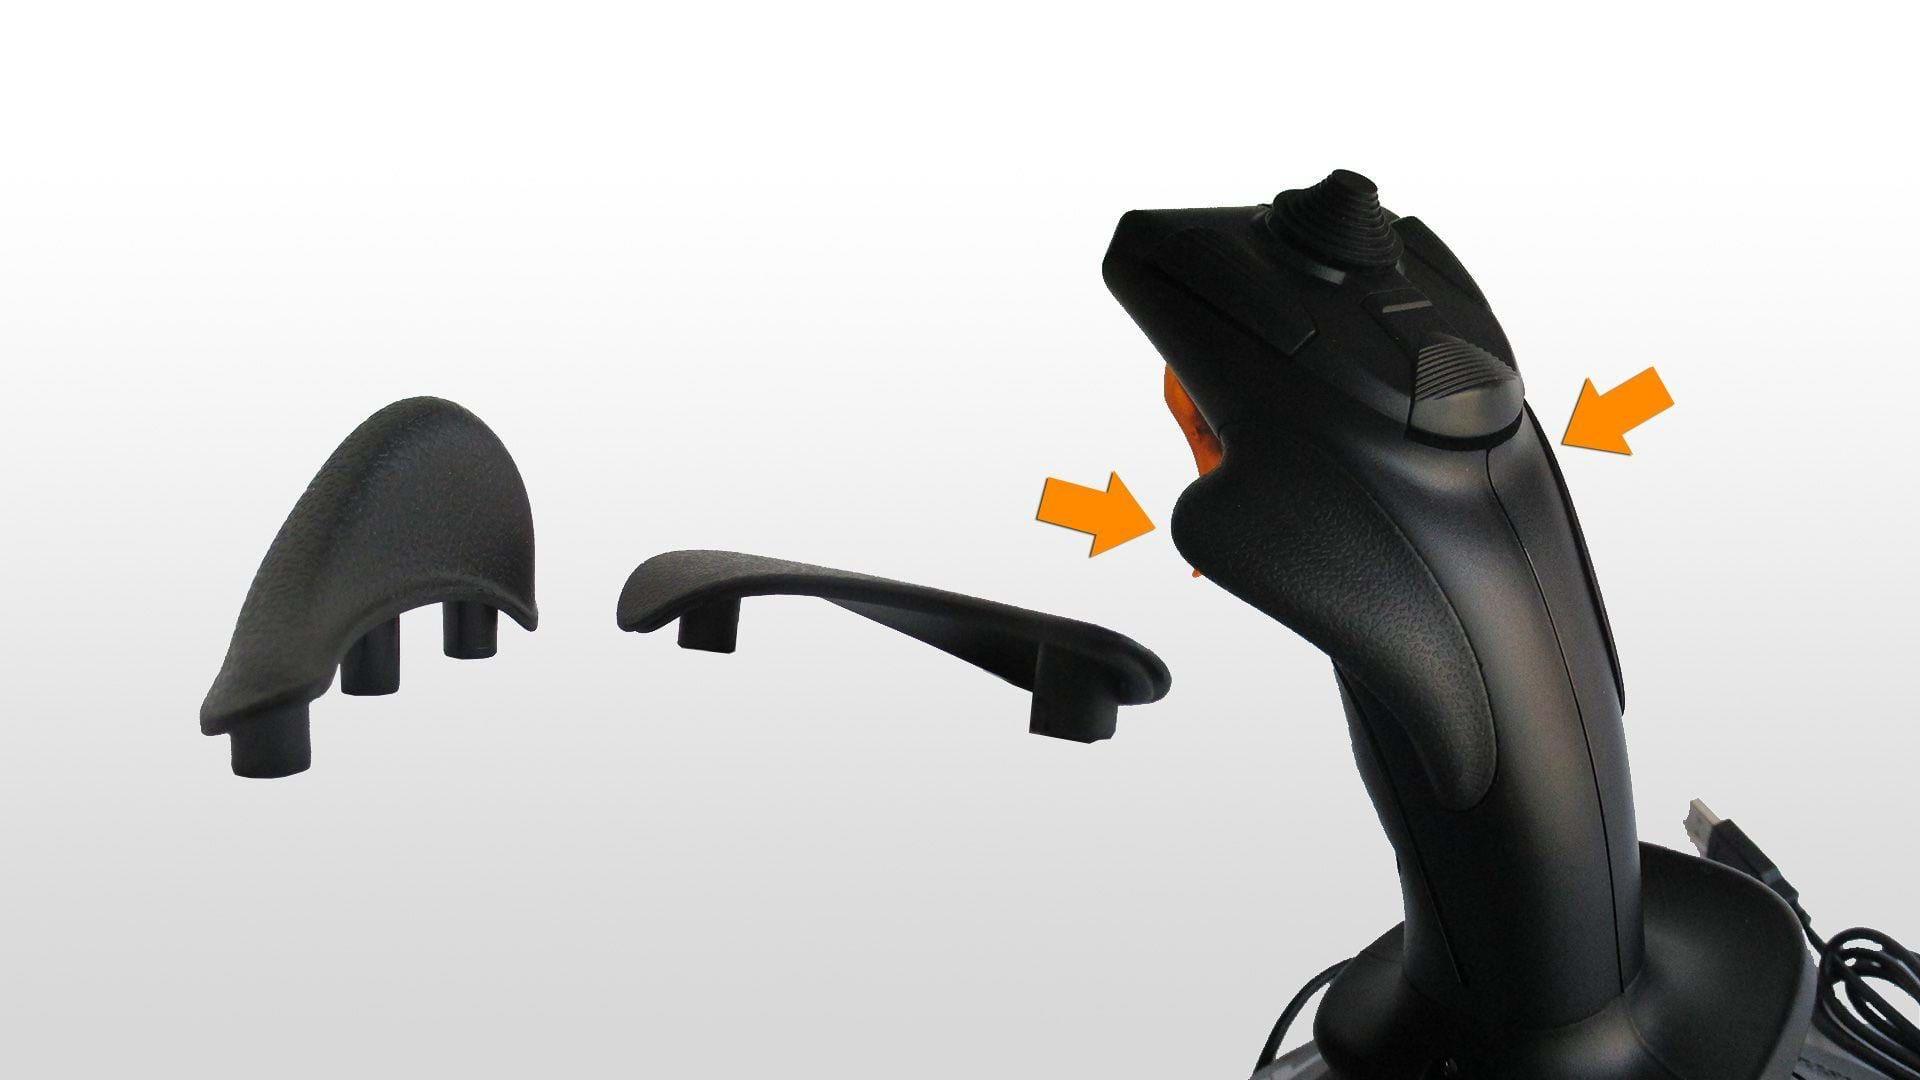 Review: Thrustmaster T 16000M FCS joystick • HeliSimmer com